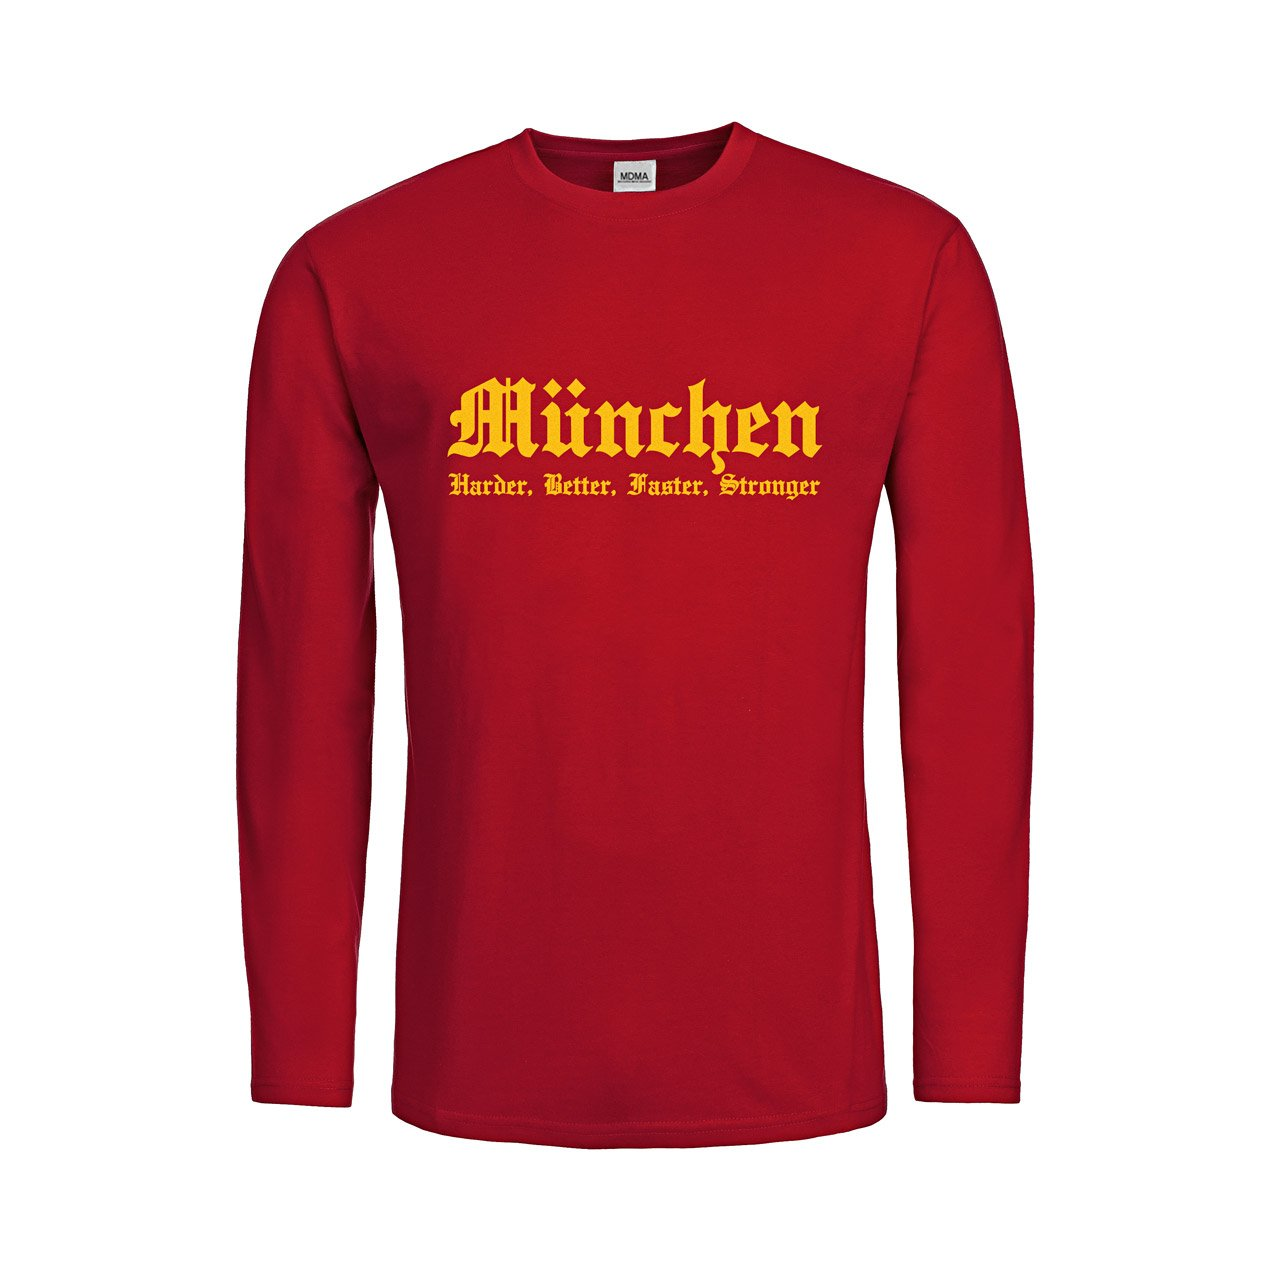 MDMA Men T-Shirt Longsleeve München Harder, Better, Faster, Stronger mdma-mtls00287 günstig online kaufen